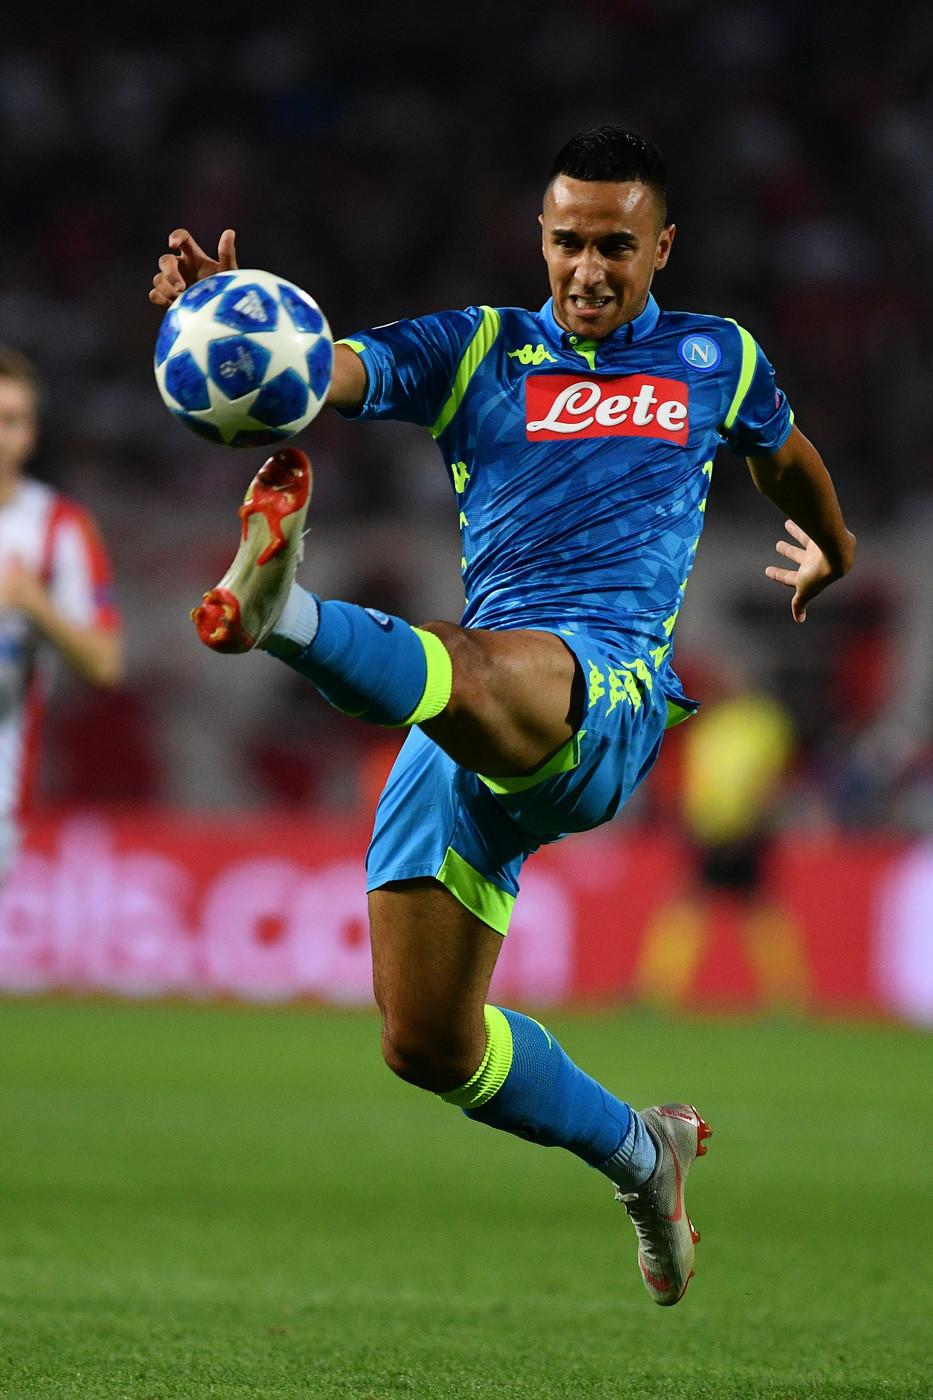 Napoli verso Toro: Ancelotti prepara turnover ma perde Ounas